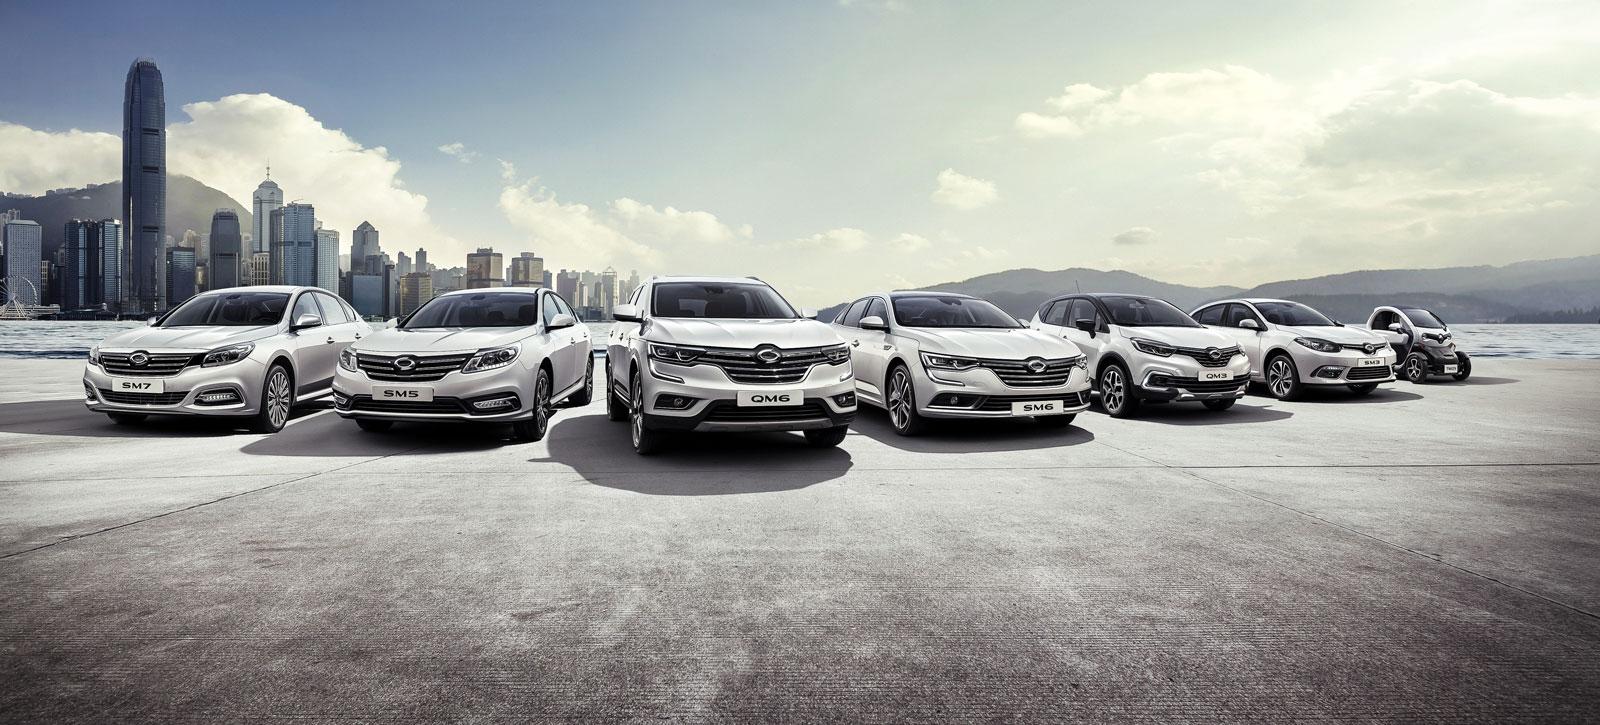 Gamme Renault Samsung Motors